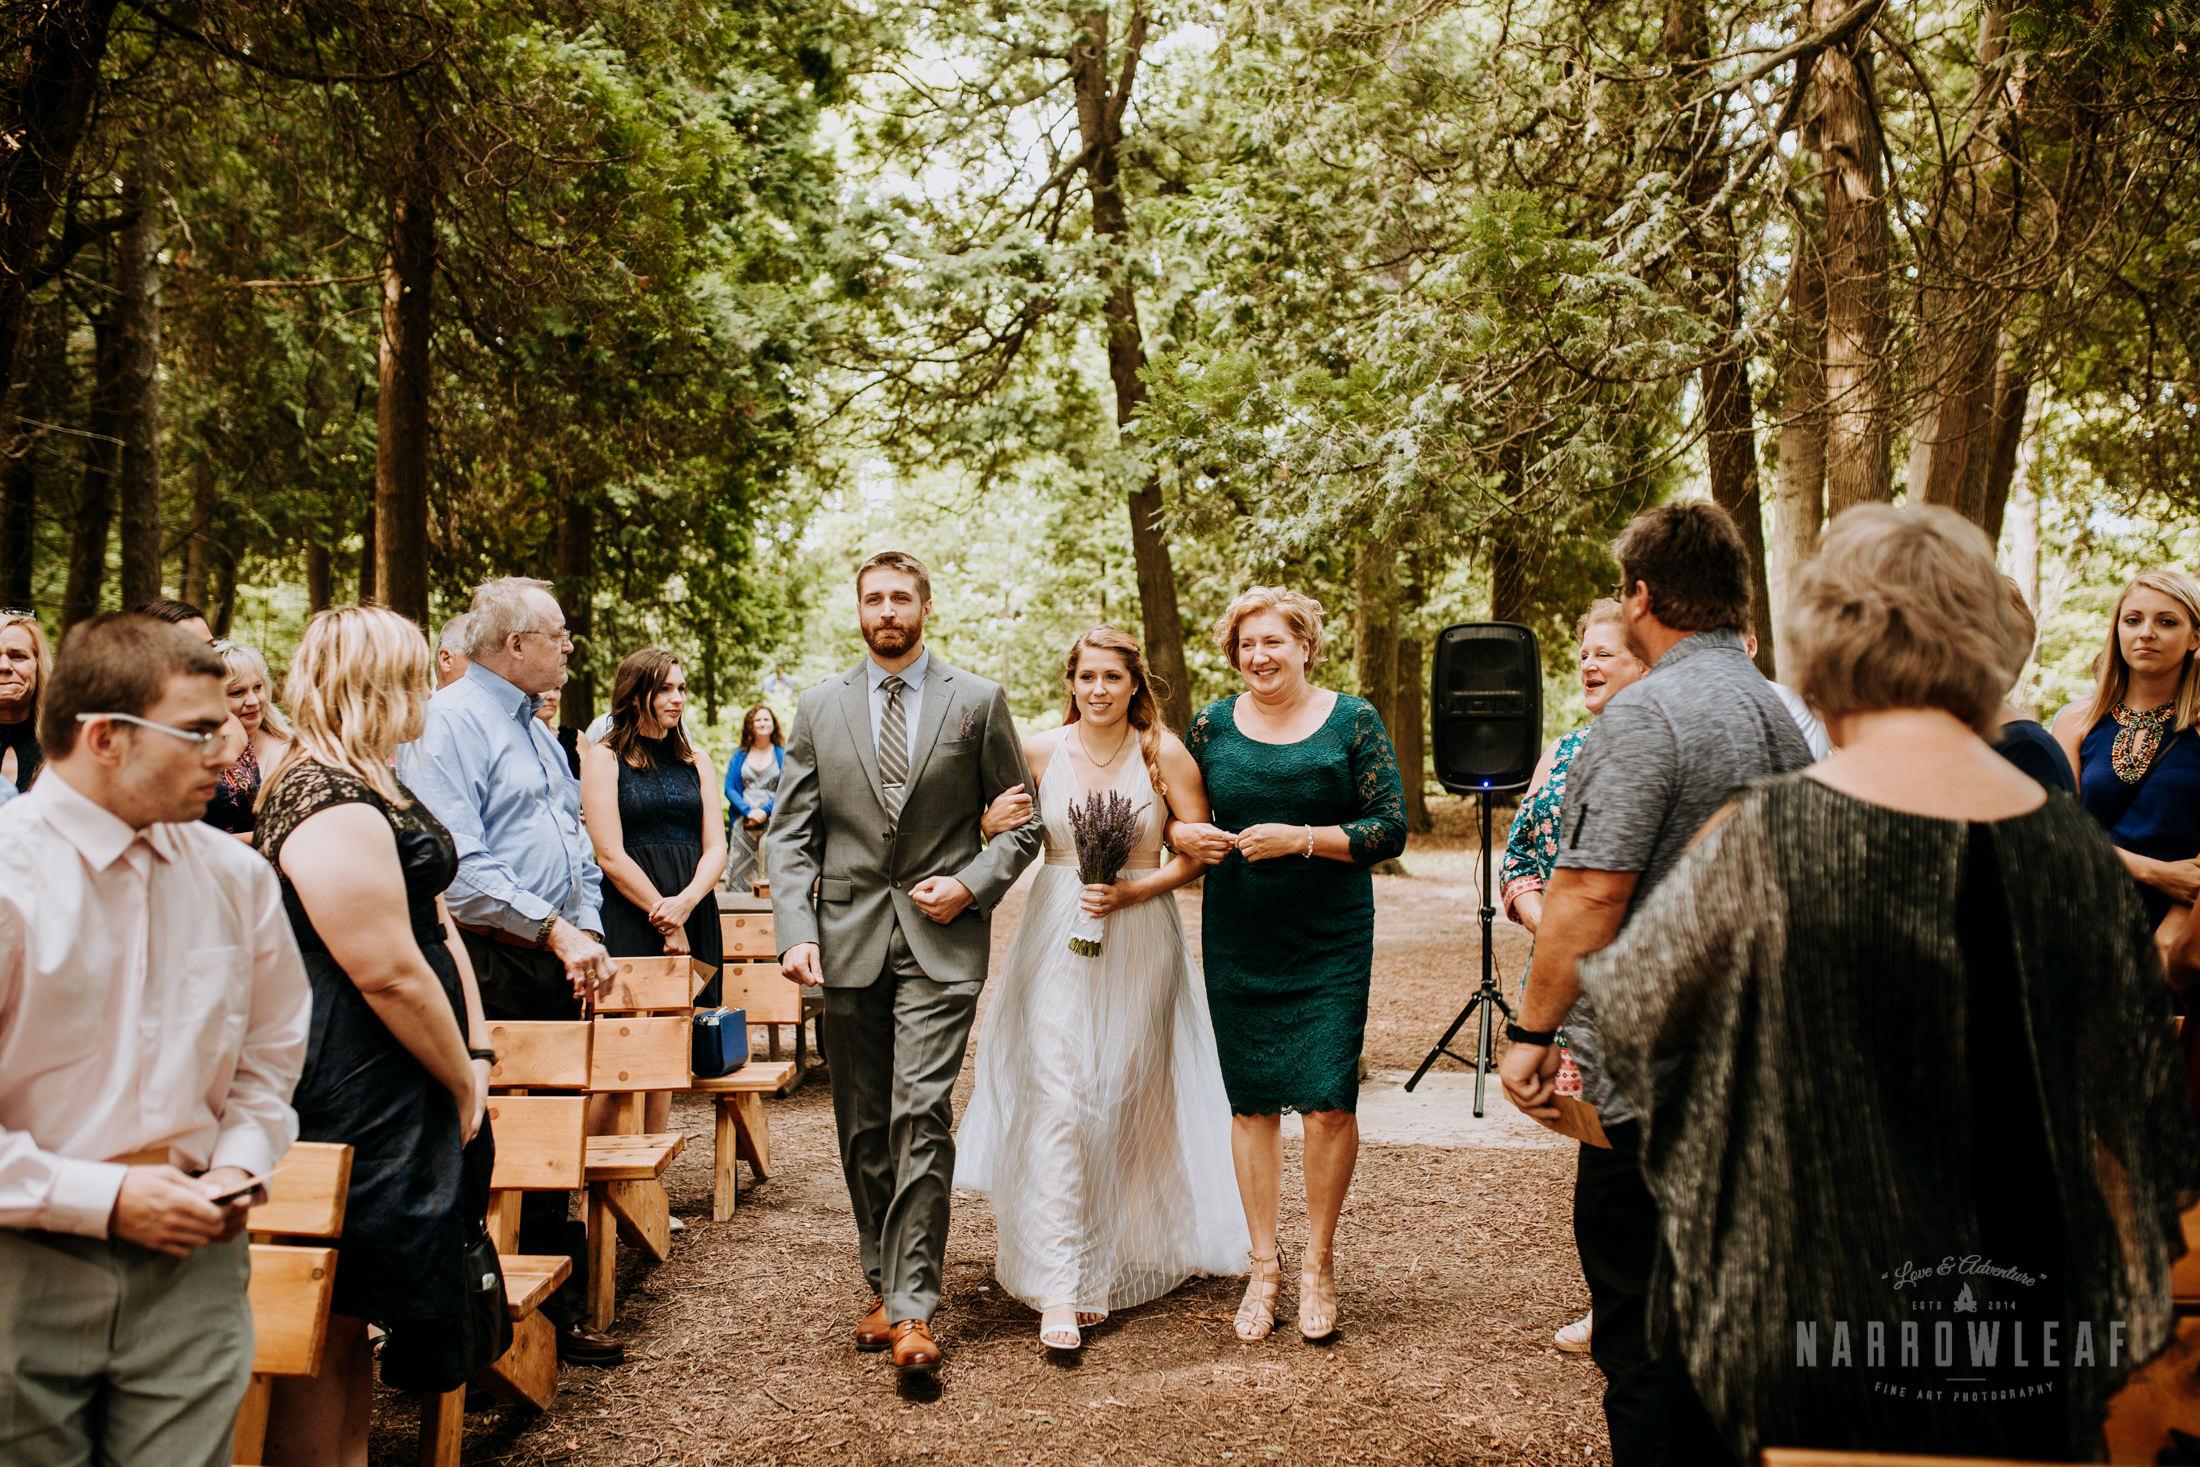 door-county-wedding-photographer-in-the-woods-Narrowleaf_Love_and_Adventure_Photography-7890.jpg